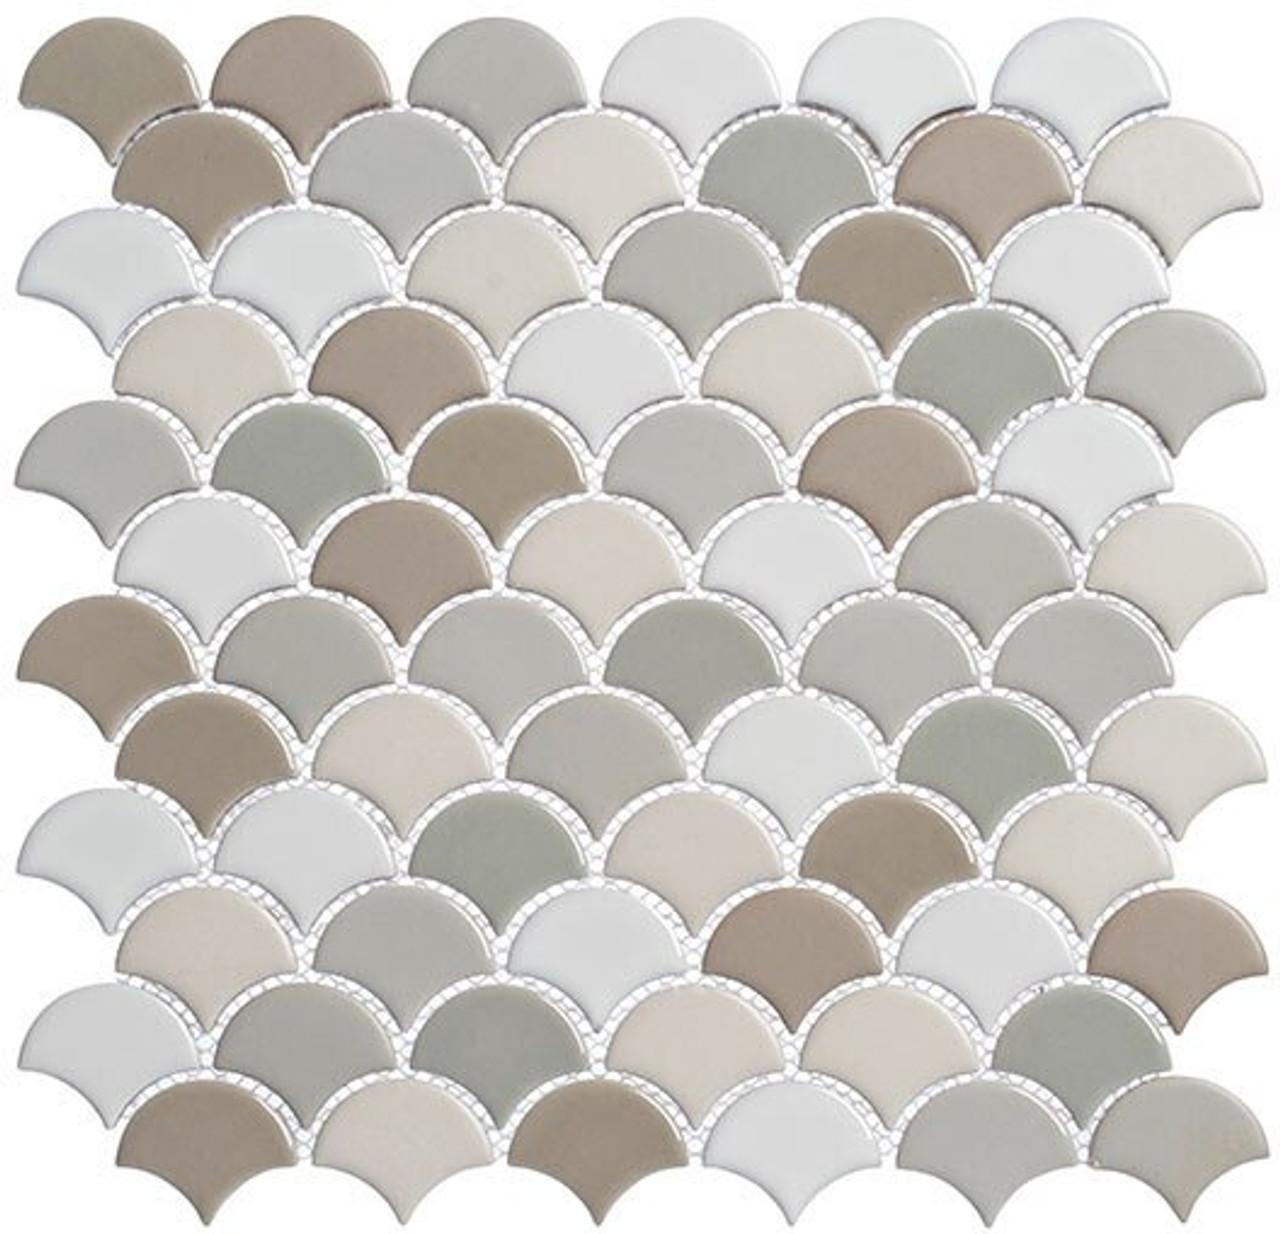 Bella Glass Tiles Scallop Lace Series SCL595 Lavish Cremes